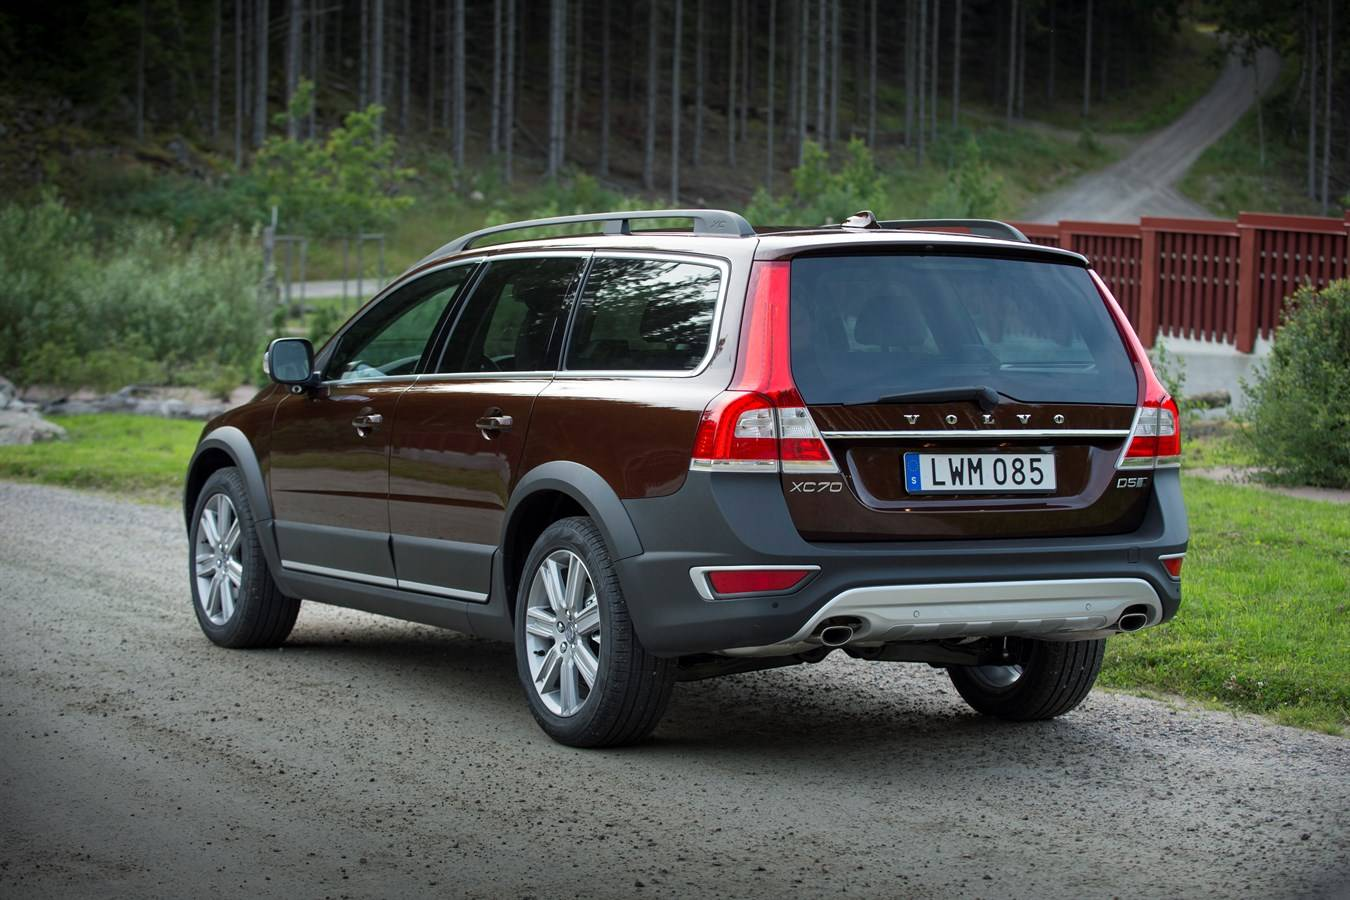 Шведский универсал: чем привлекает Volvo XC70 II